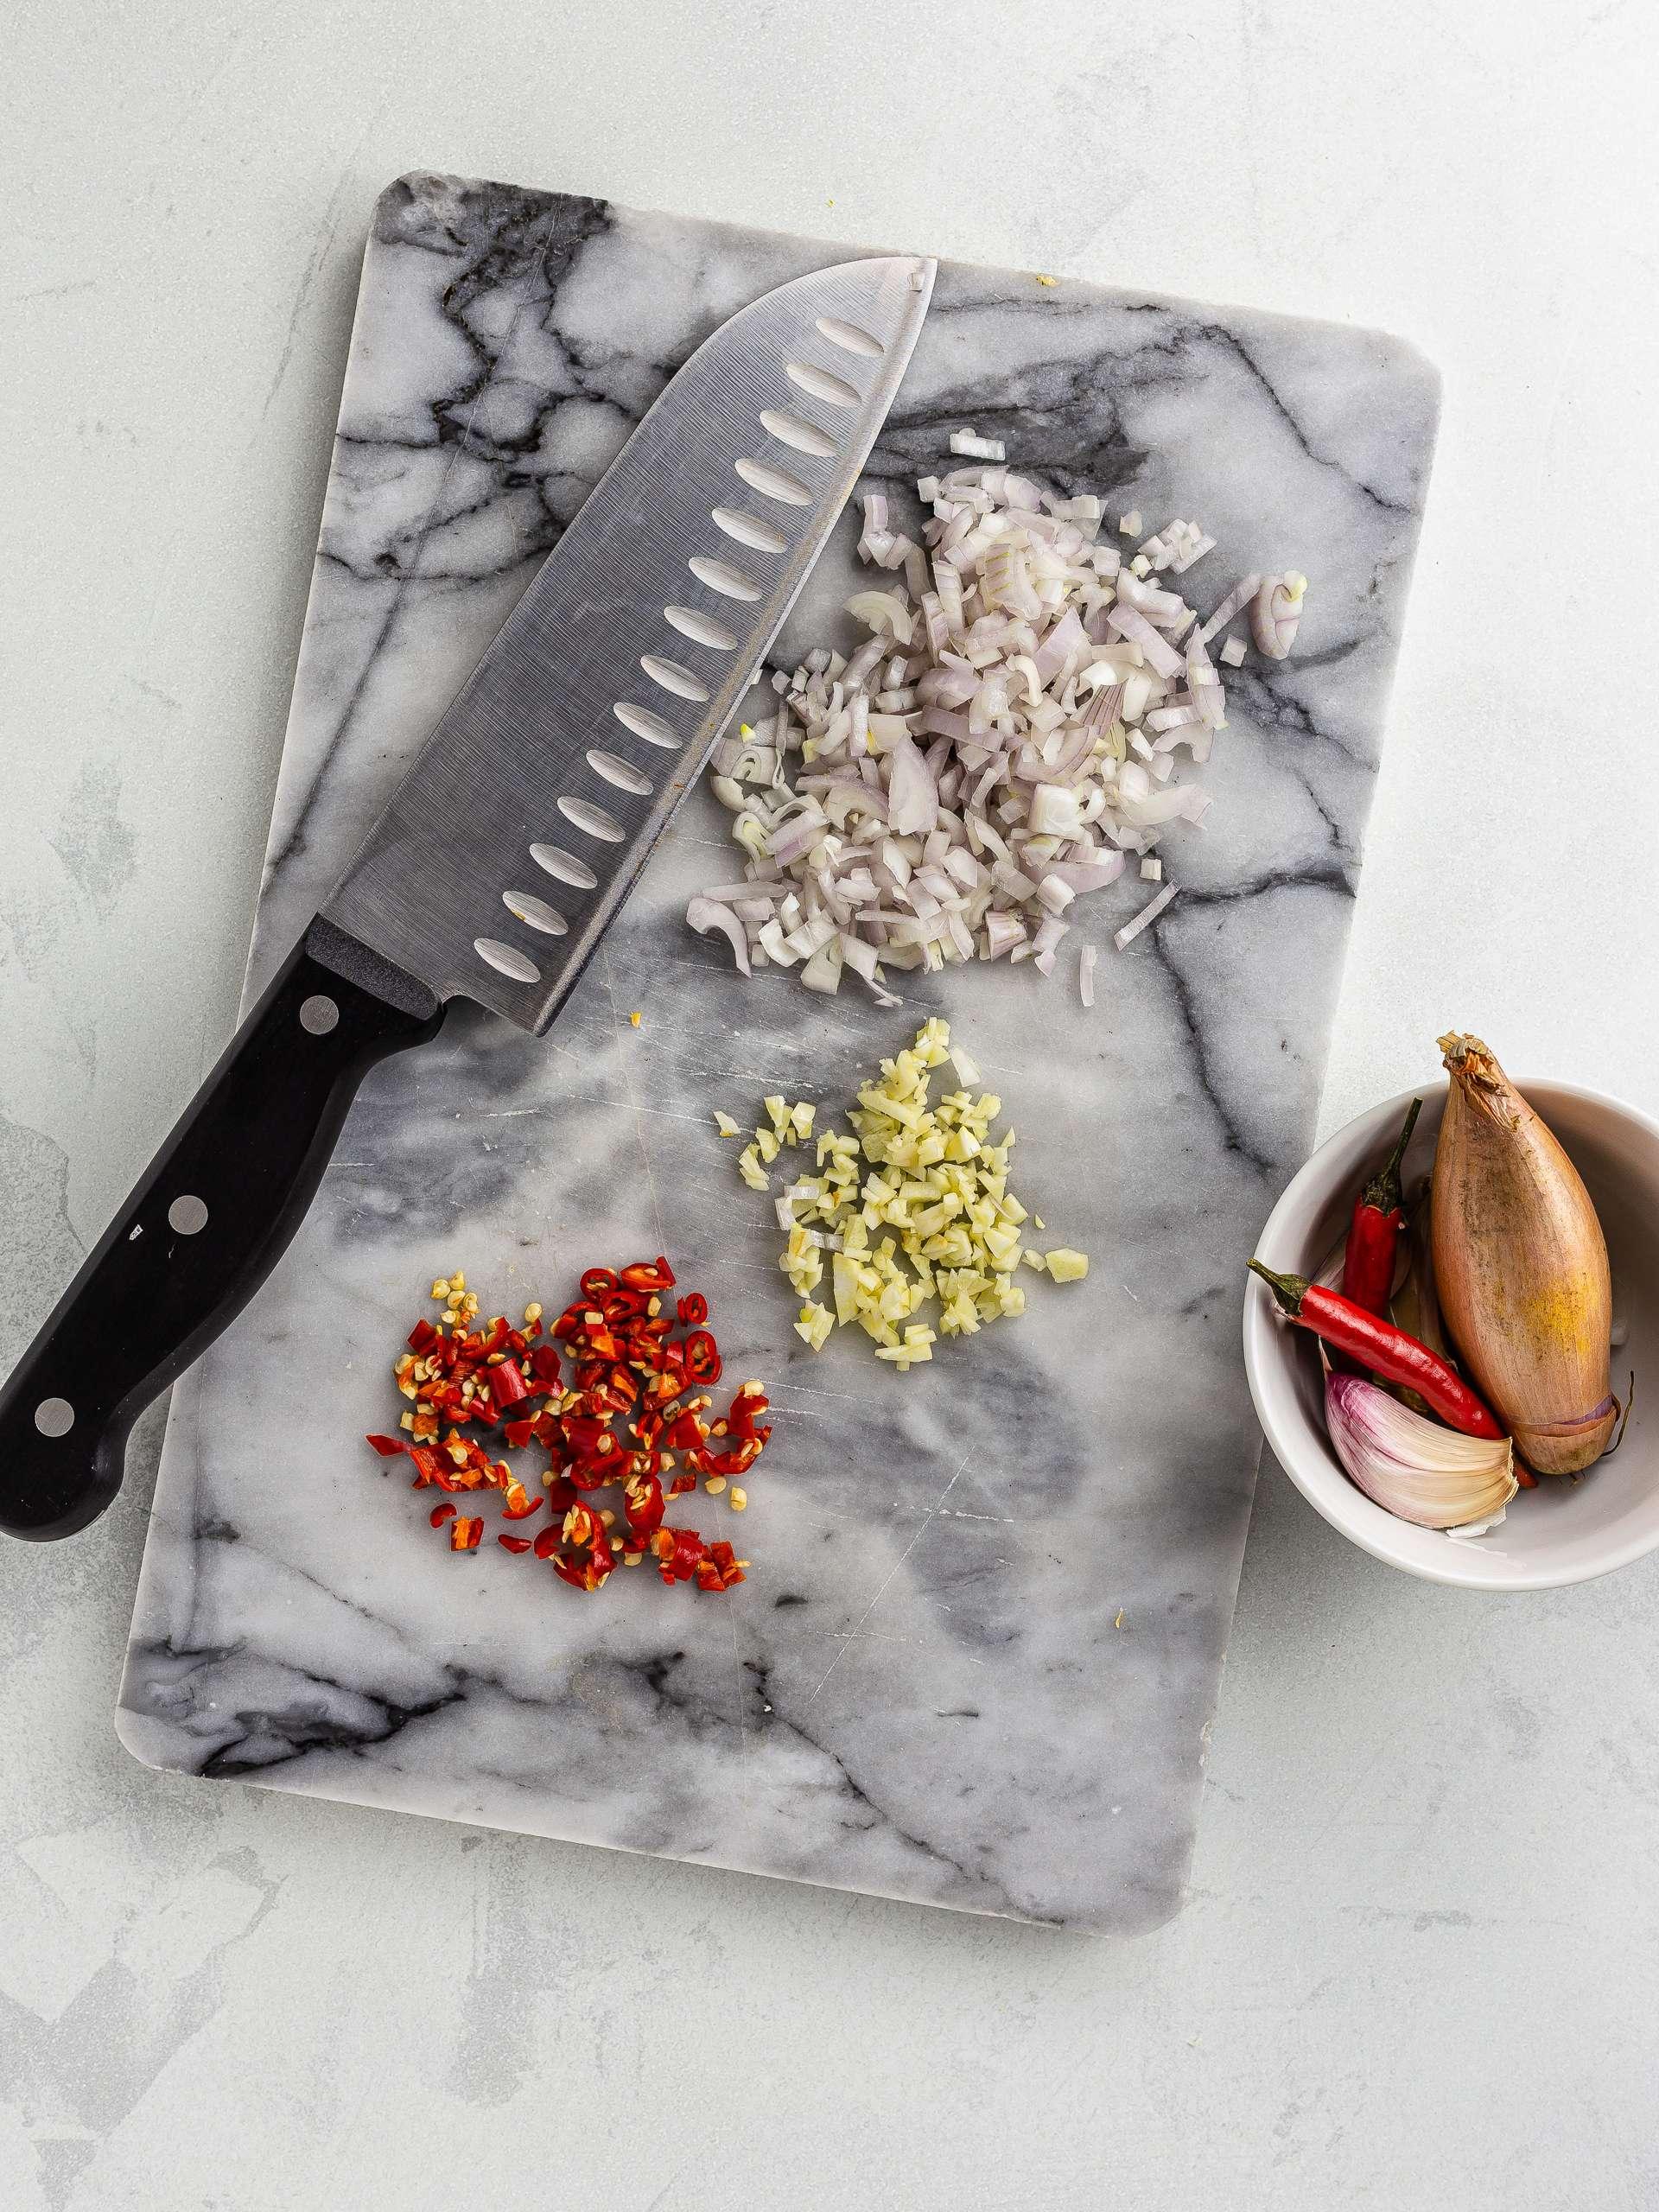 chopped shallots, onions, and bird's eye chillies